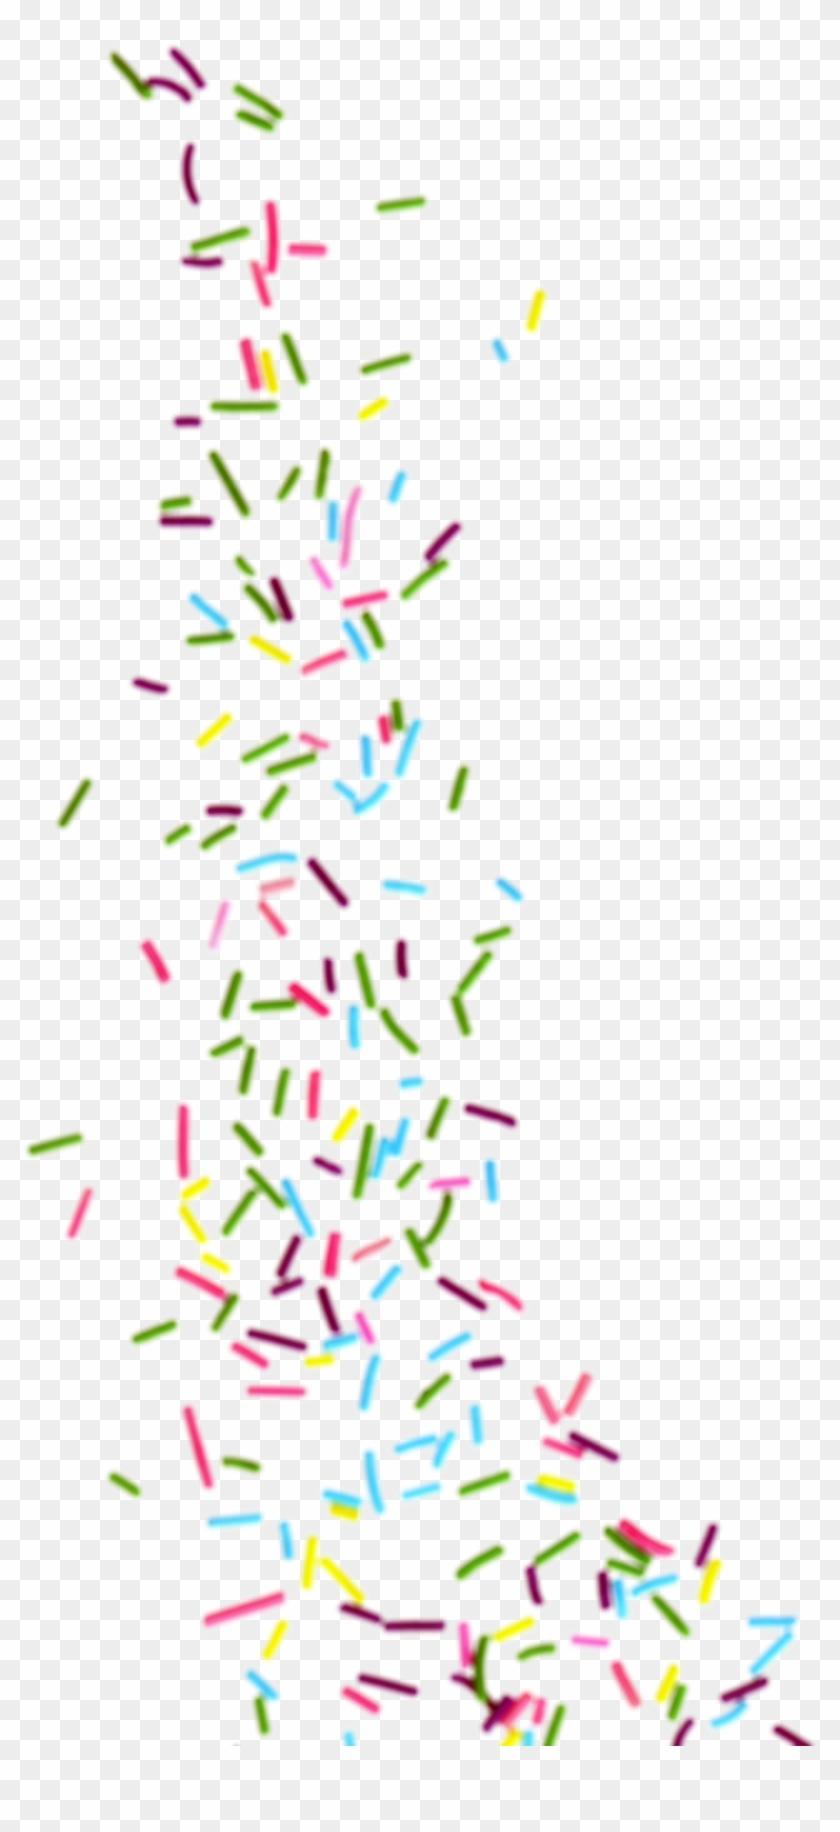 Cupcake Transparent Sprinkle Full, HD Png Download.